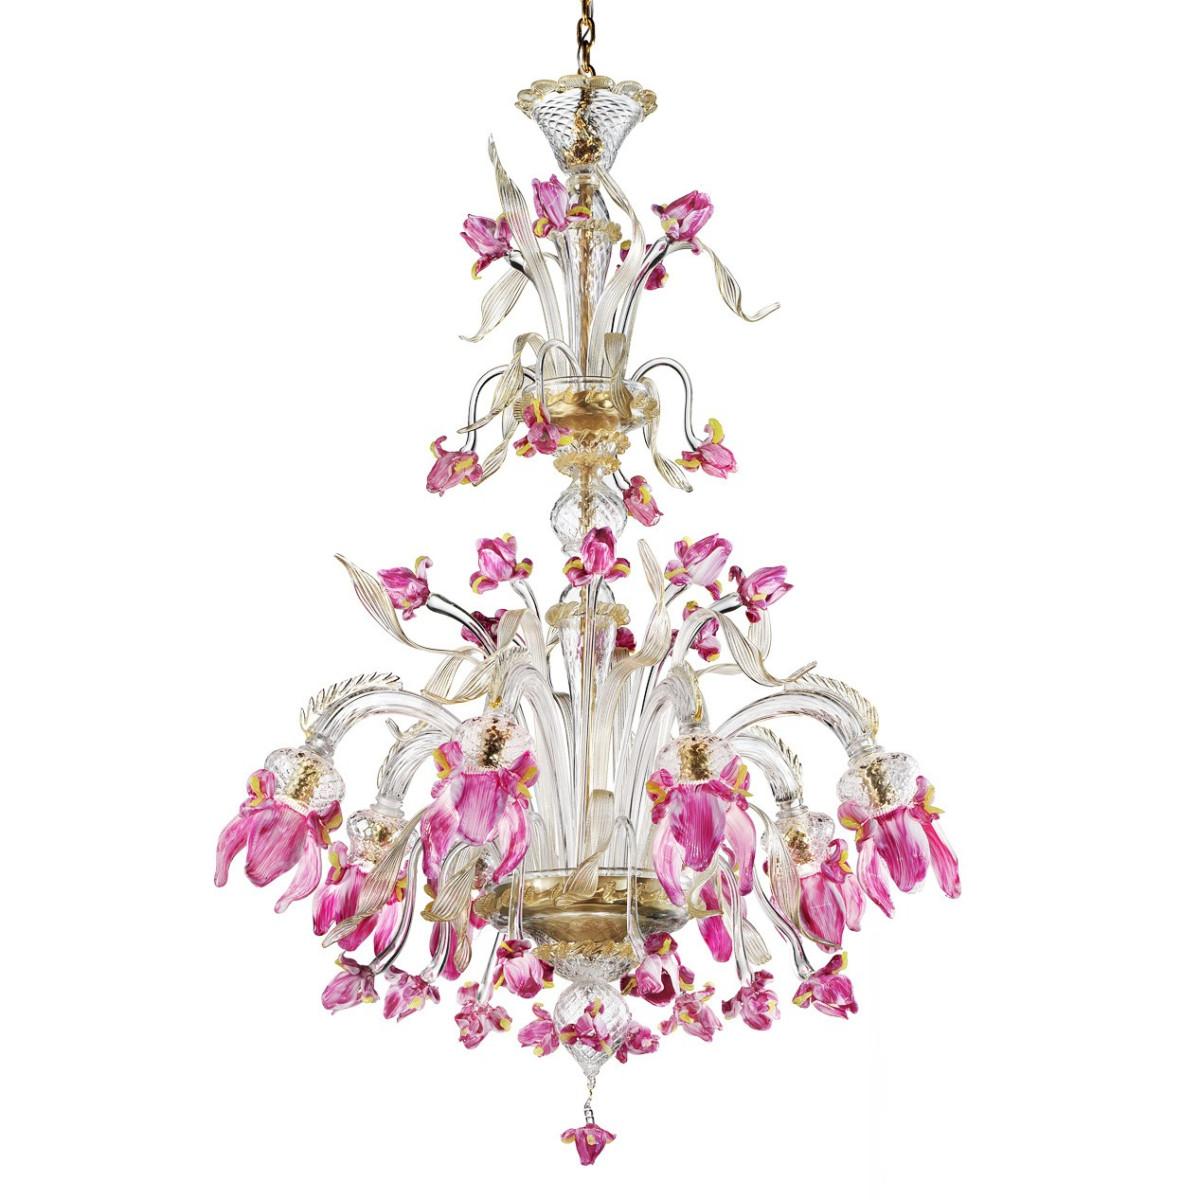 """Delizia"" 8 lights pink flowers tall Murano glass chandelier"